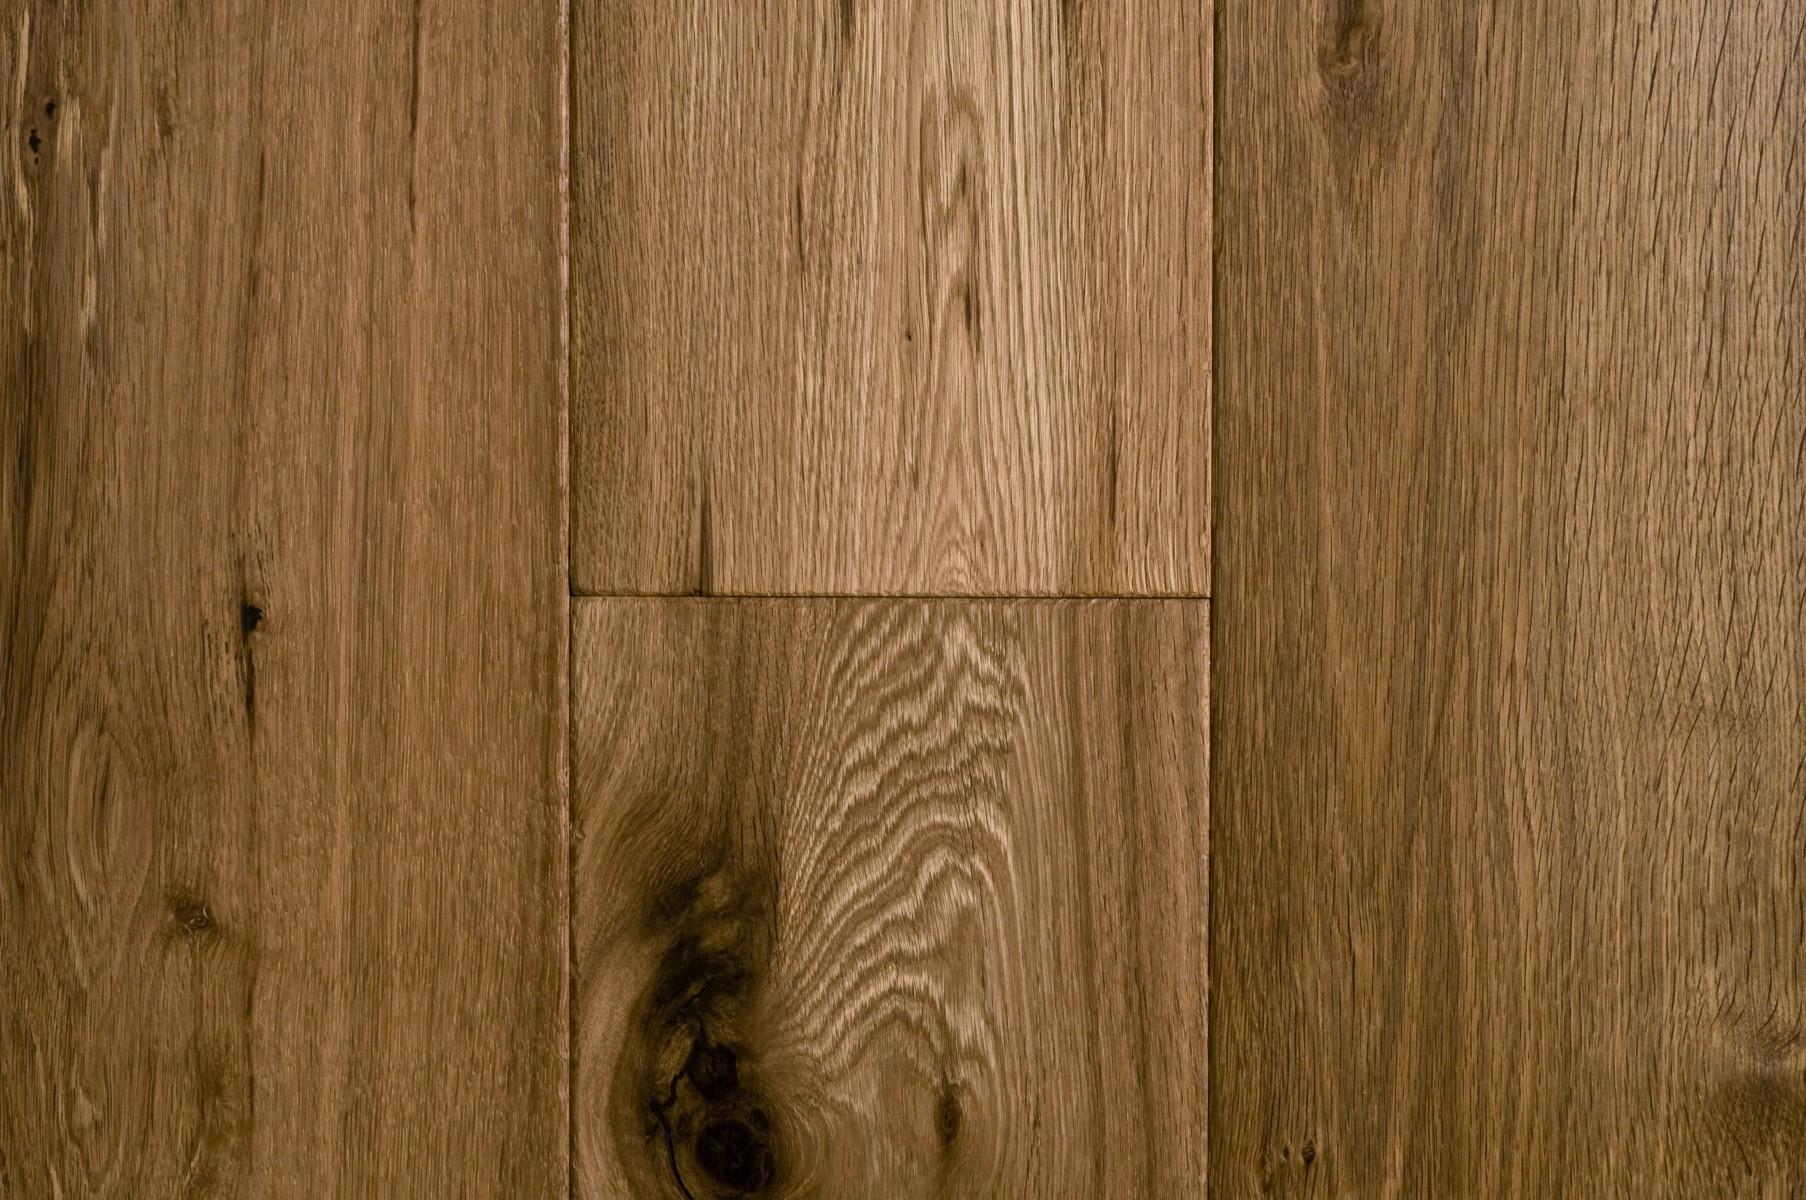 kentwood hardwood flooring prices of duchateau hardwood flooring houston tx discount engineered wood throughout hardwood floors a· olde dutch european oak